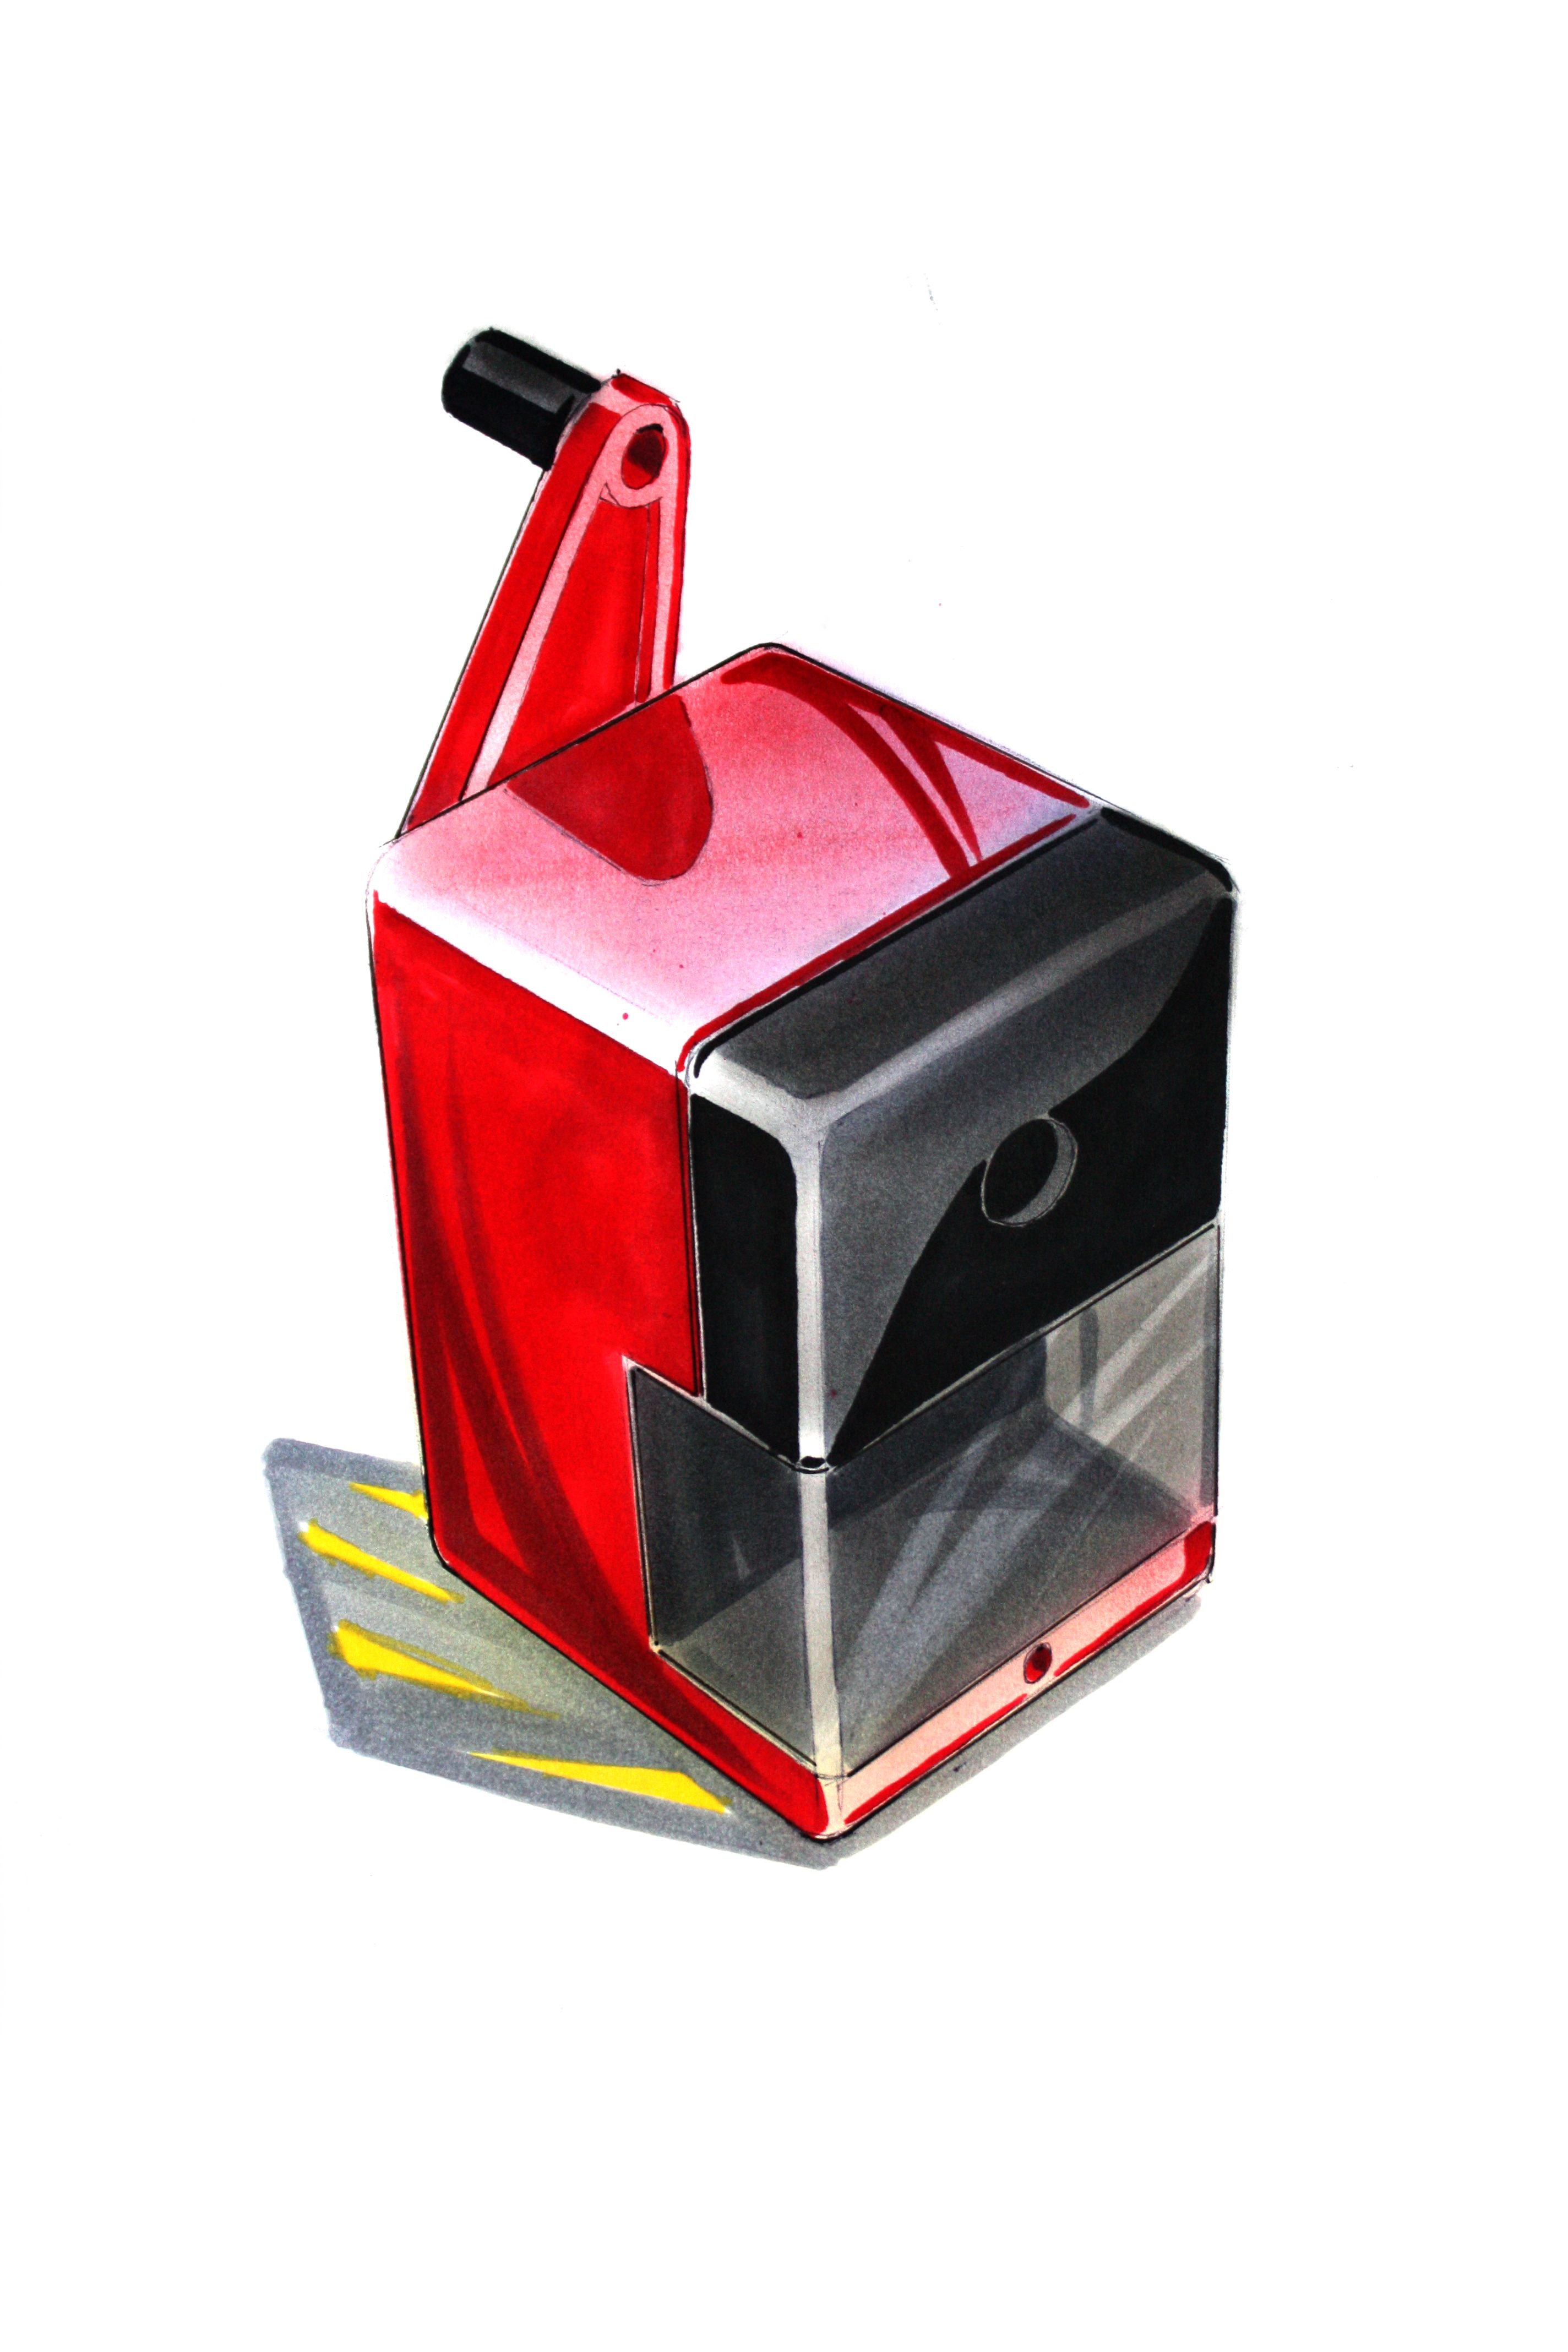 pencil sharpener rendering by marker amp pastel technique